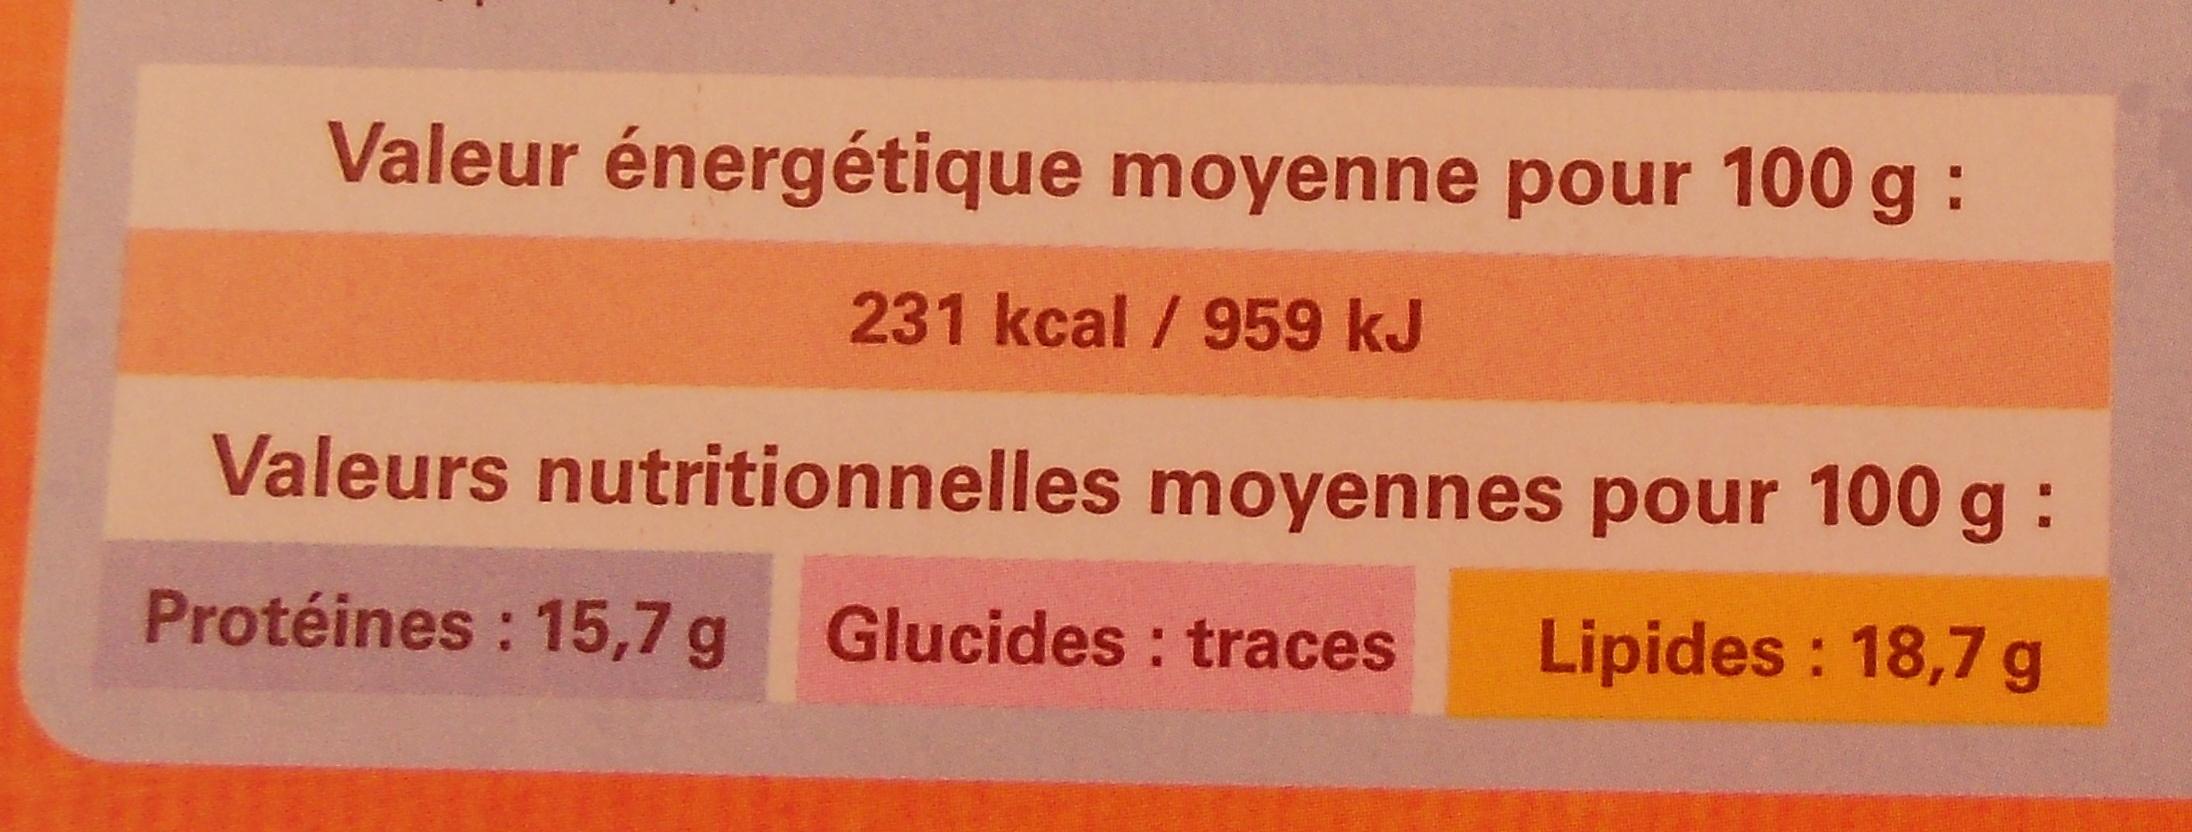 Rôti d'agneau farci, Surgelé - Voedingswaarden - fr